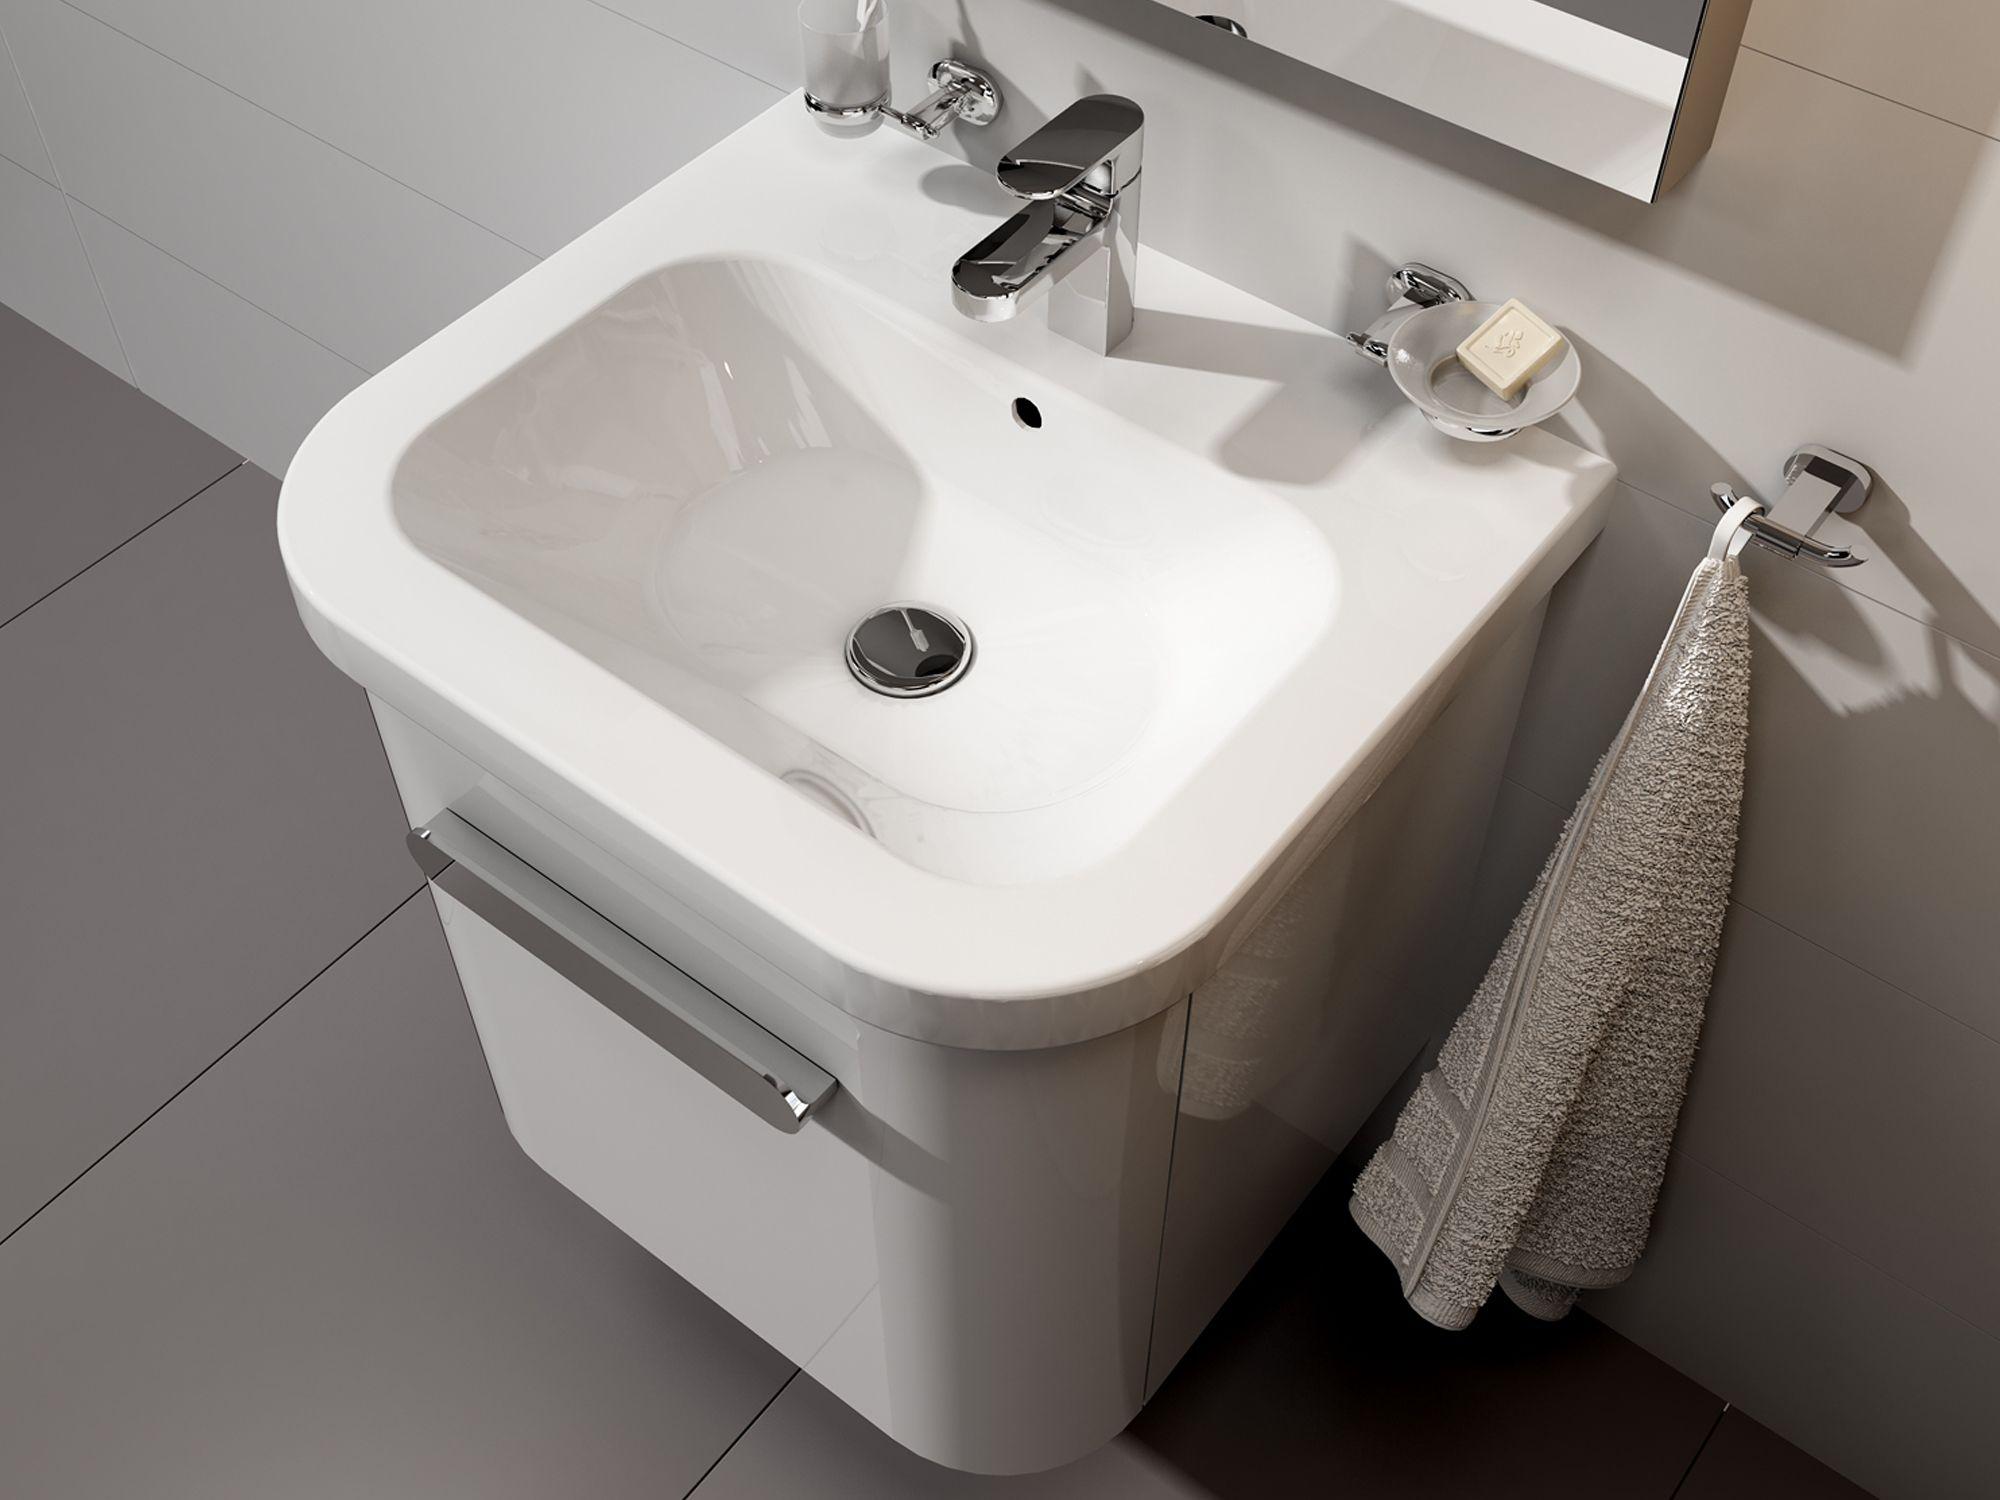 Aixeta lavabo Ravak Chrome a Barcelona